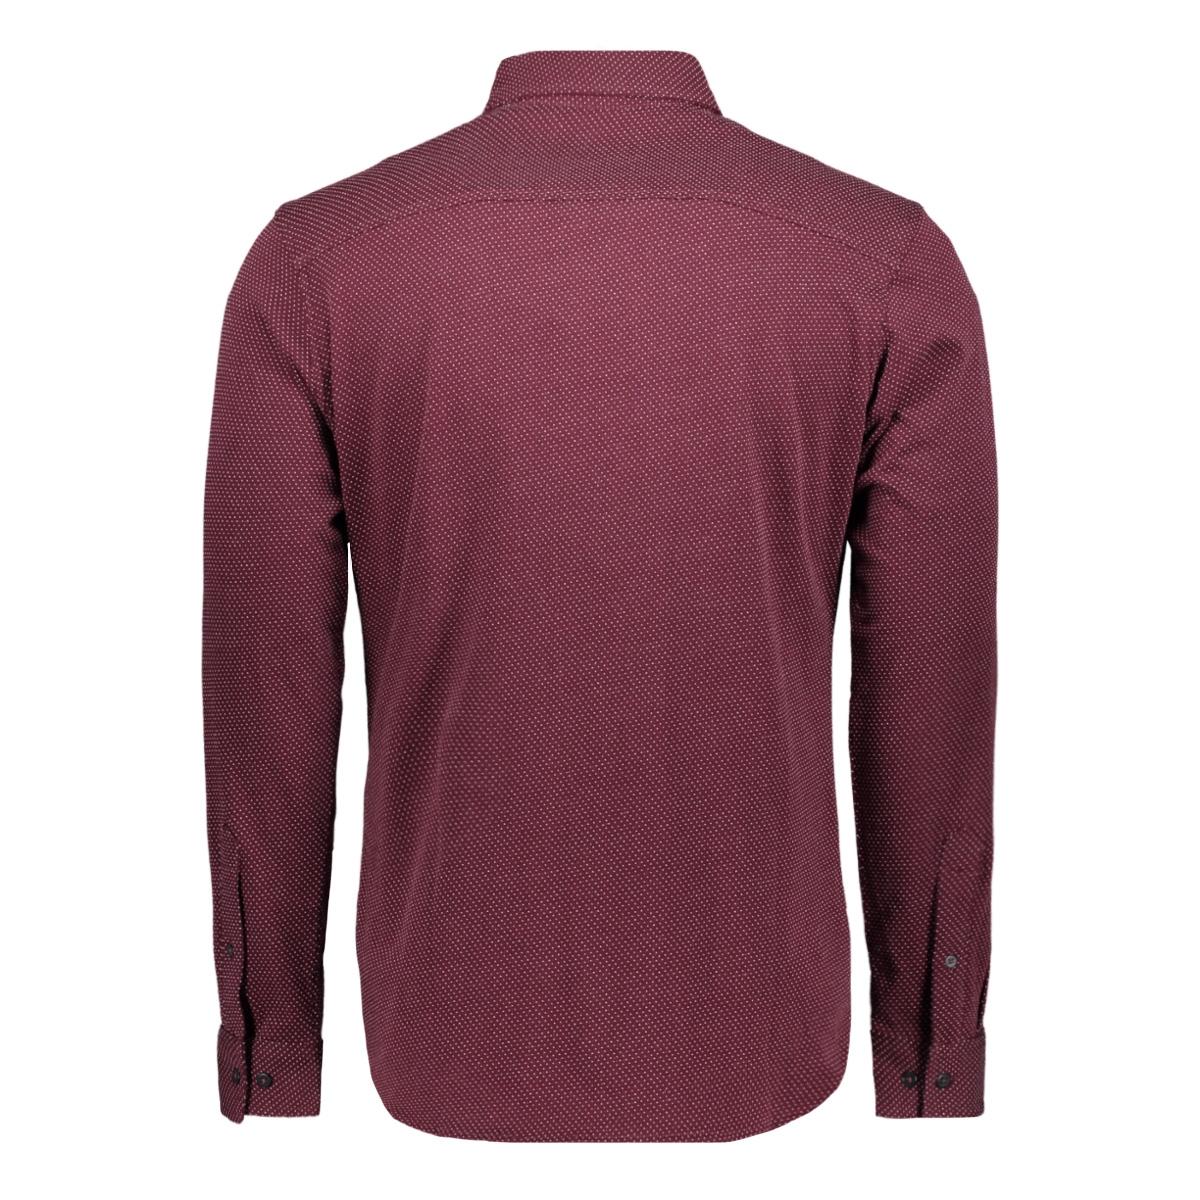 jcojersey shirt ls one pocket 12161663 jack & jones overhemd port royale